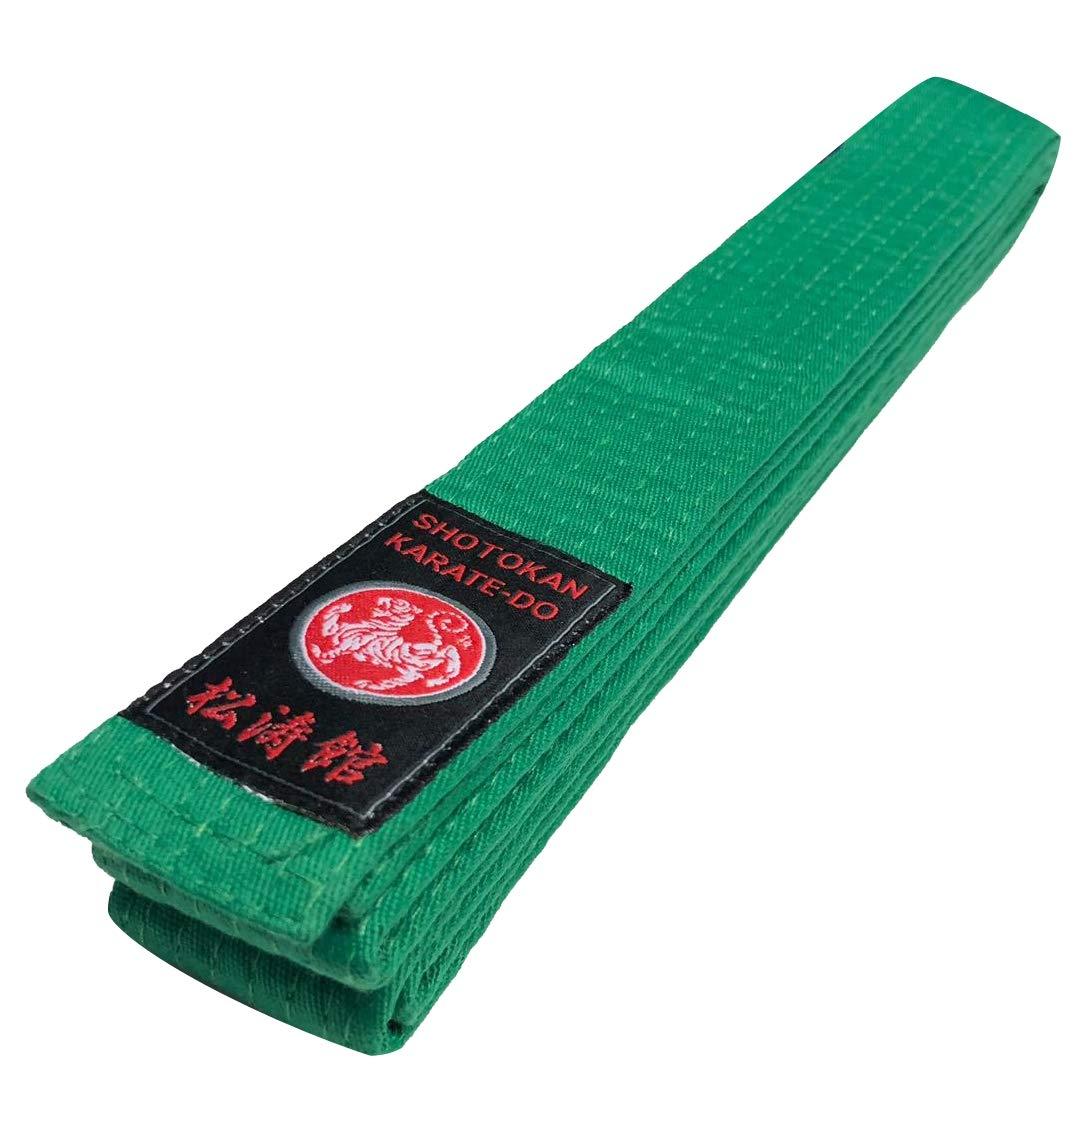 Budodrake Shotokan Karateg/ürtel Silver Edition 100/% Cotton gr/ün